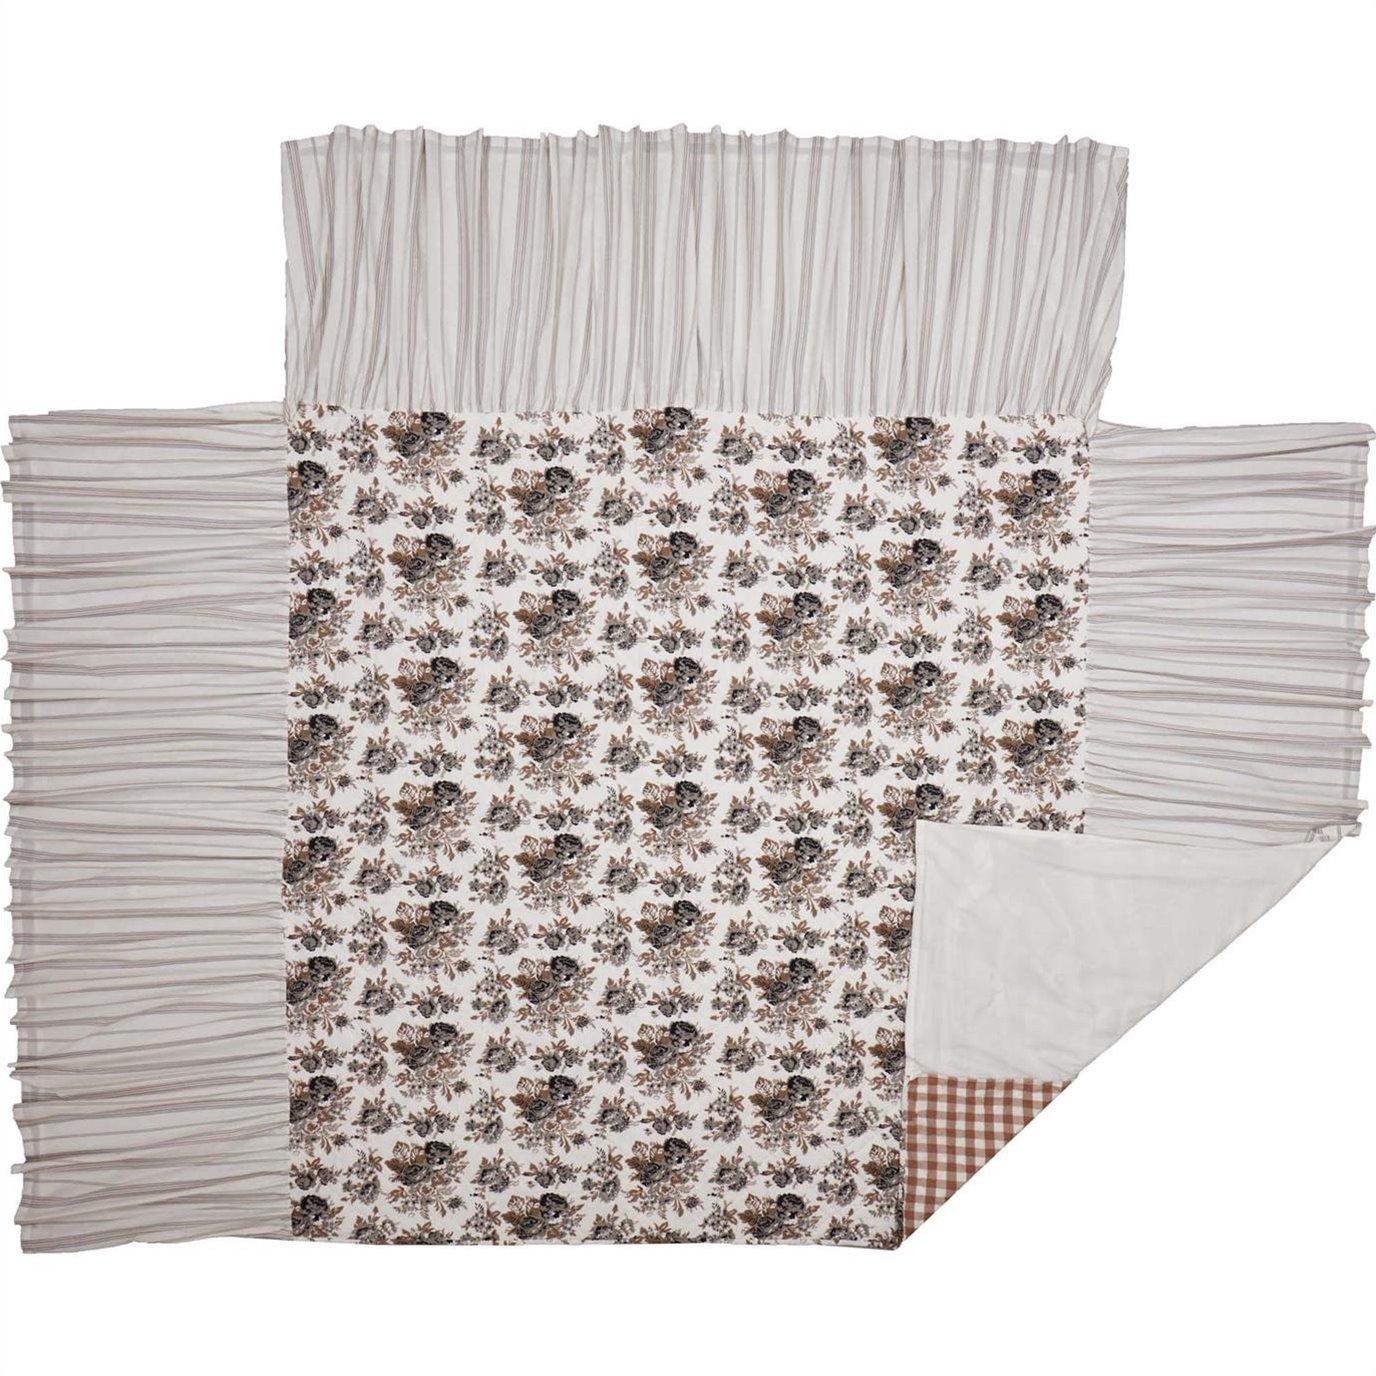 Annie Portabella Floral Ruffled King Coverlet 80x76+27